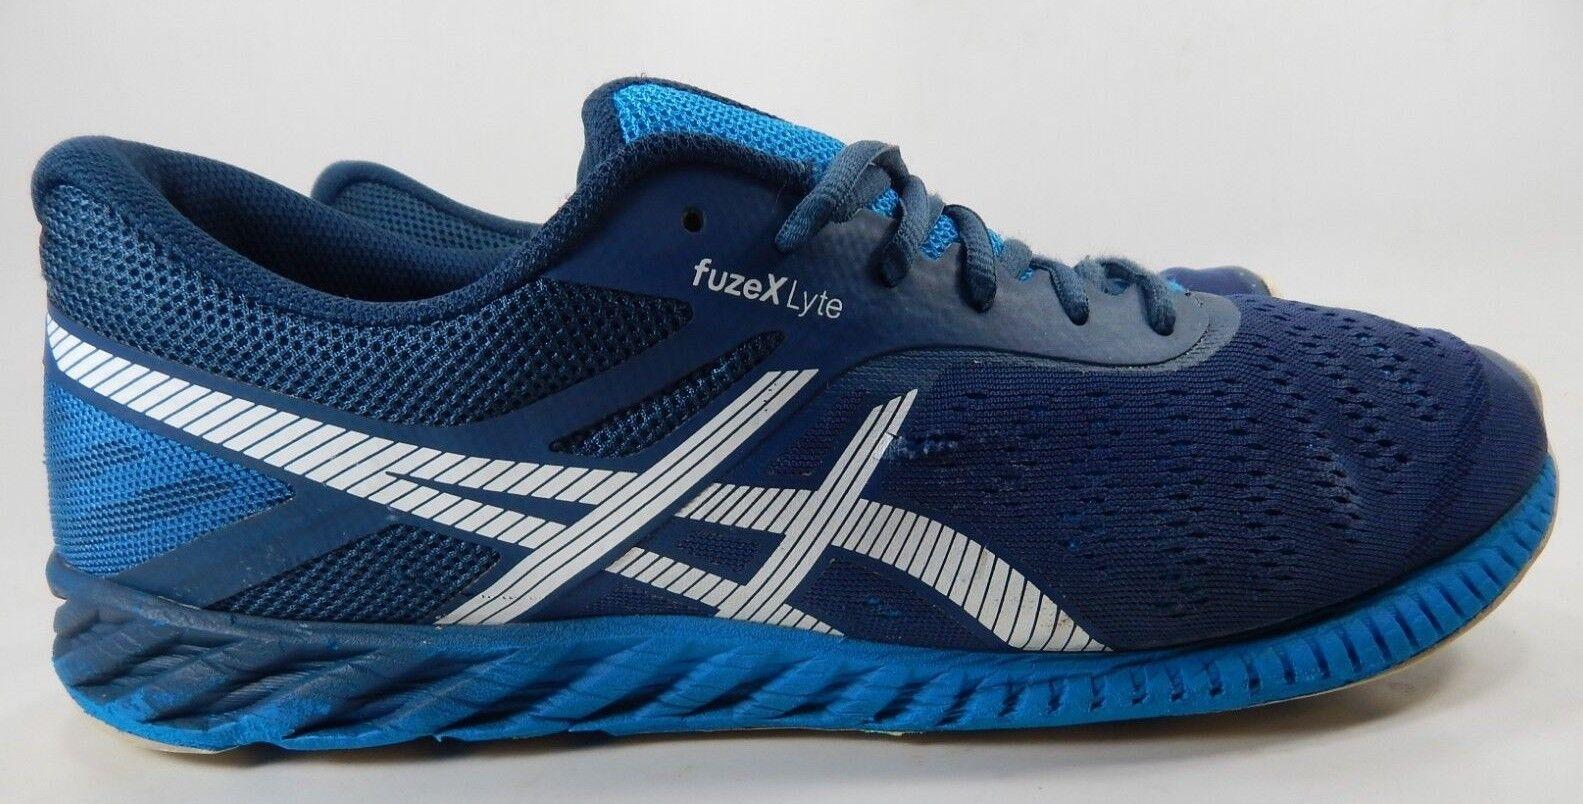 Asics FuzeX Lyte Size US 13 M (D) EU 48 Men's Running shoes bluee White T620N